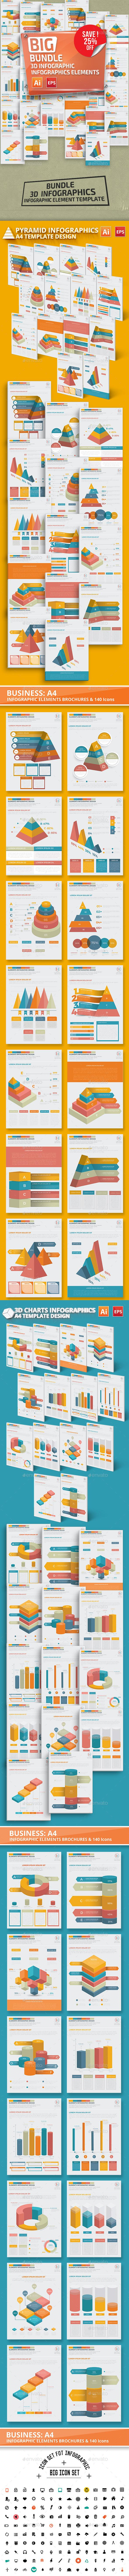 Bundle 3D Infographics - Infographics